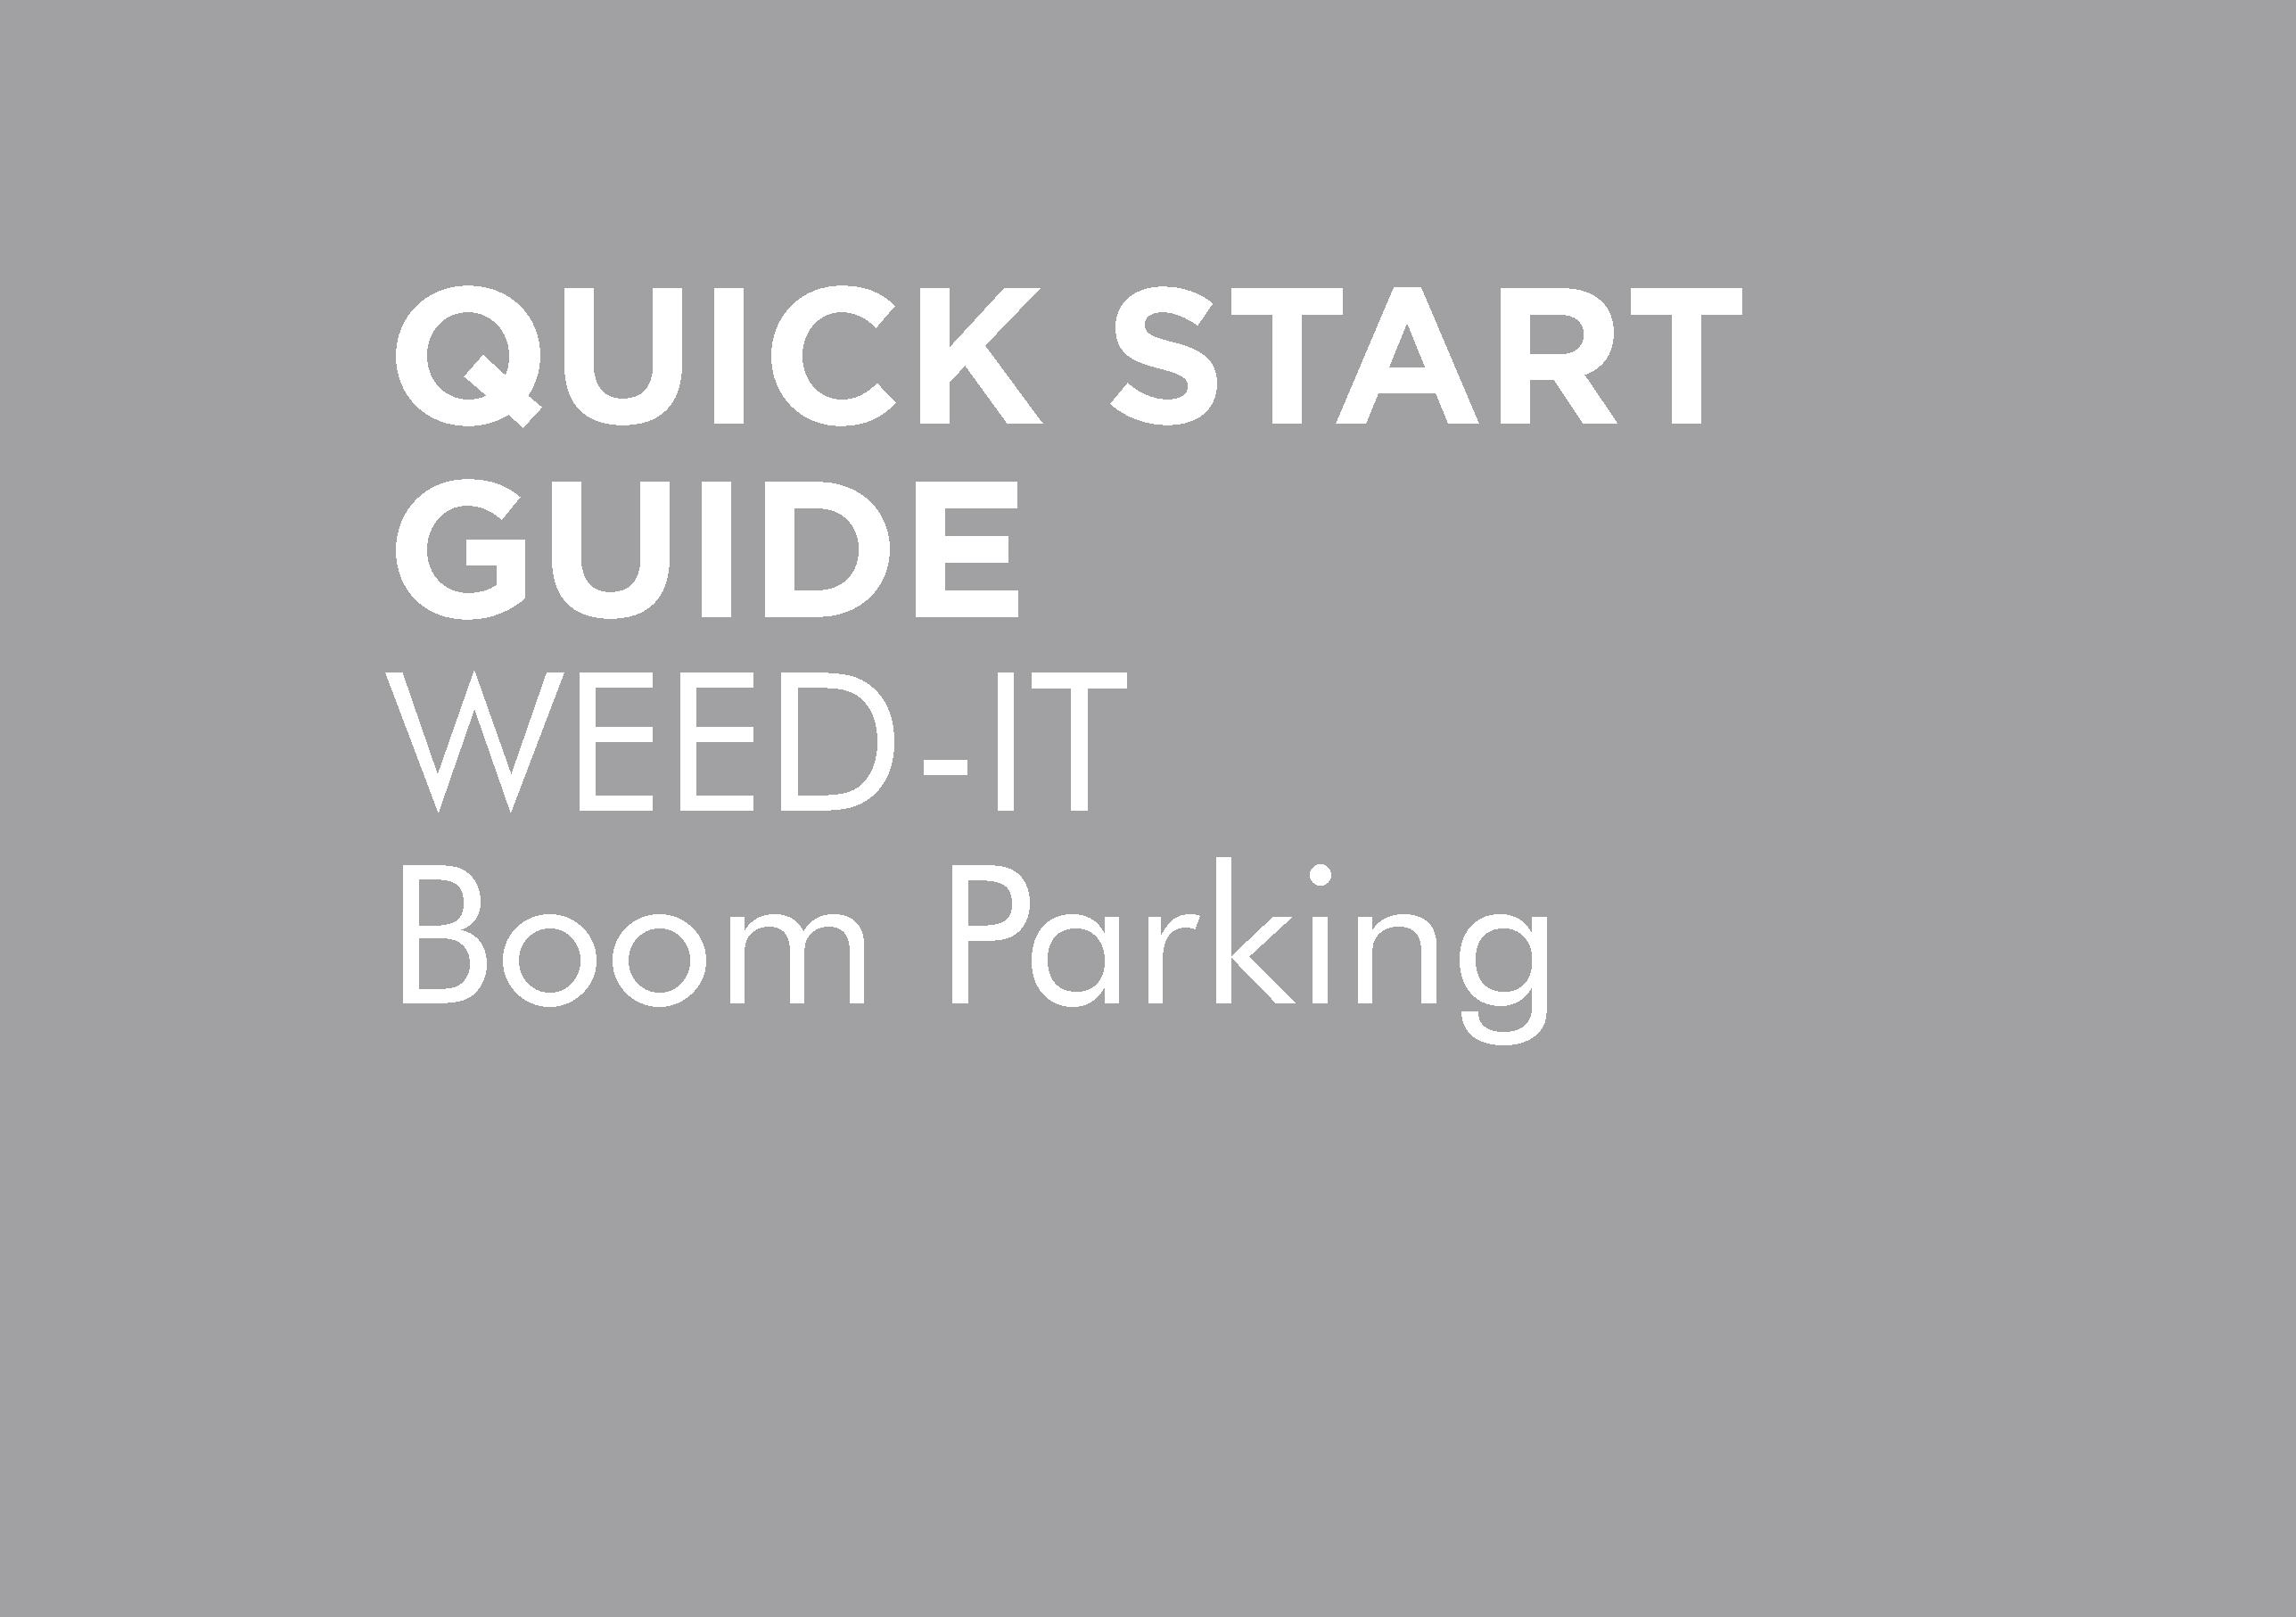 BT-OMWEED-QSG-B – WEEDIT BOOM PARKING QUICK START GUIDE V3